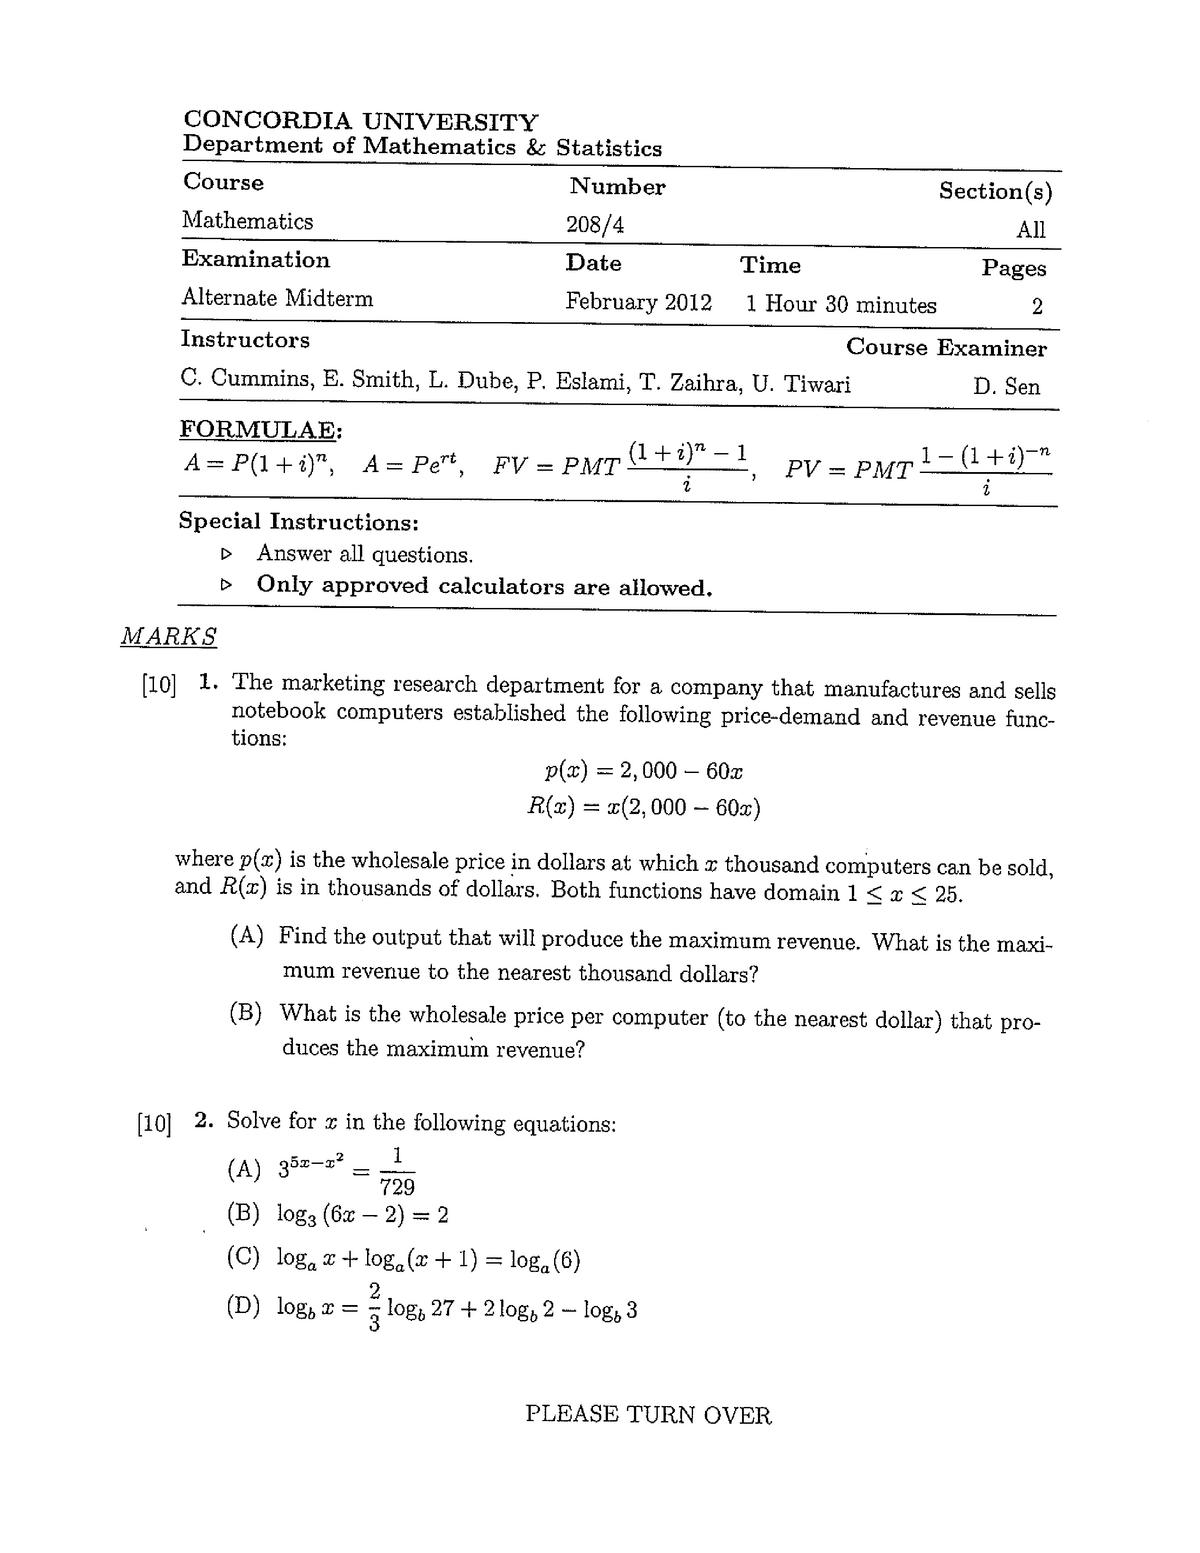 Exam 2009 - MATH 208: Fundamental Mathematics I - StuDocu